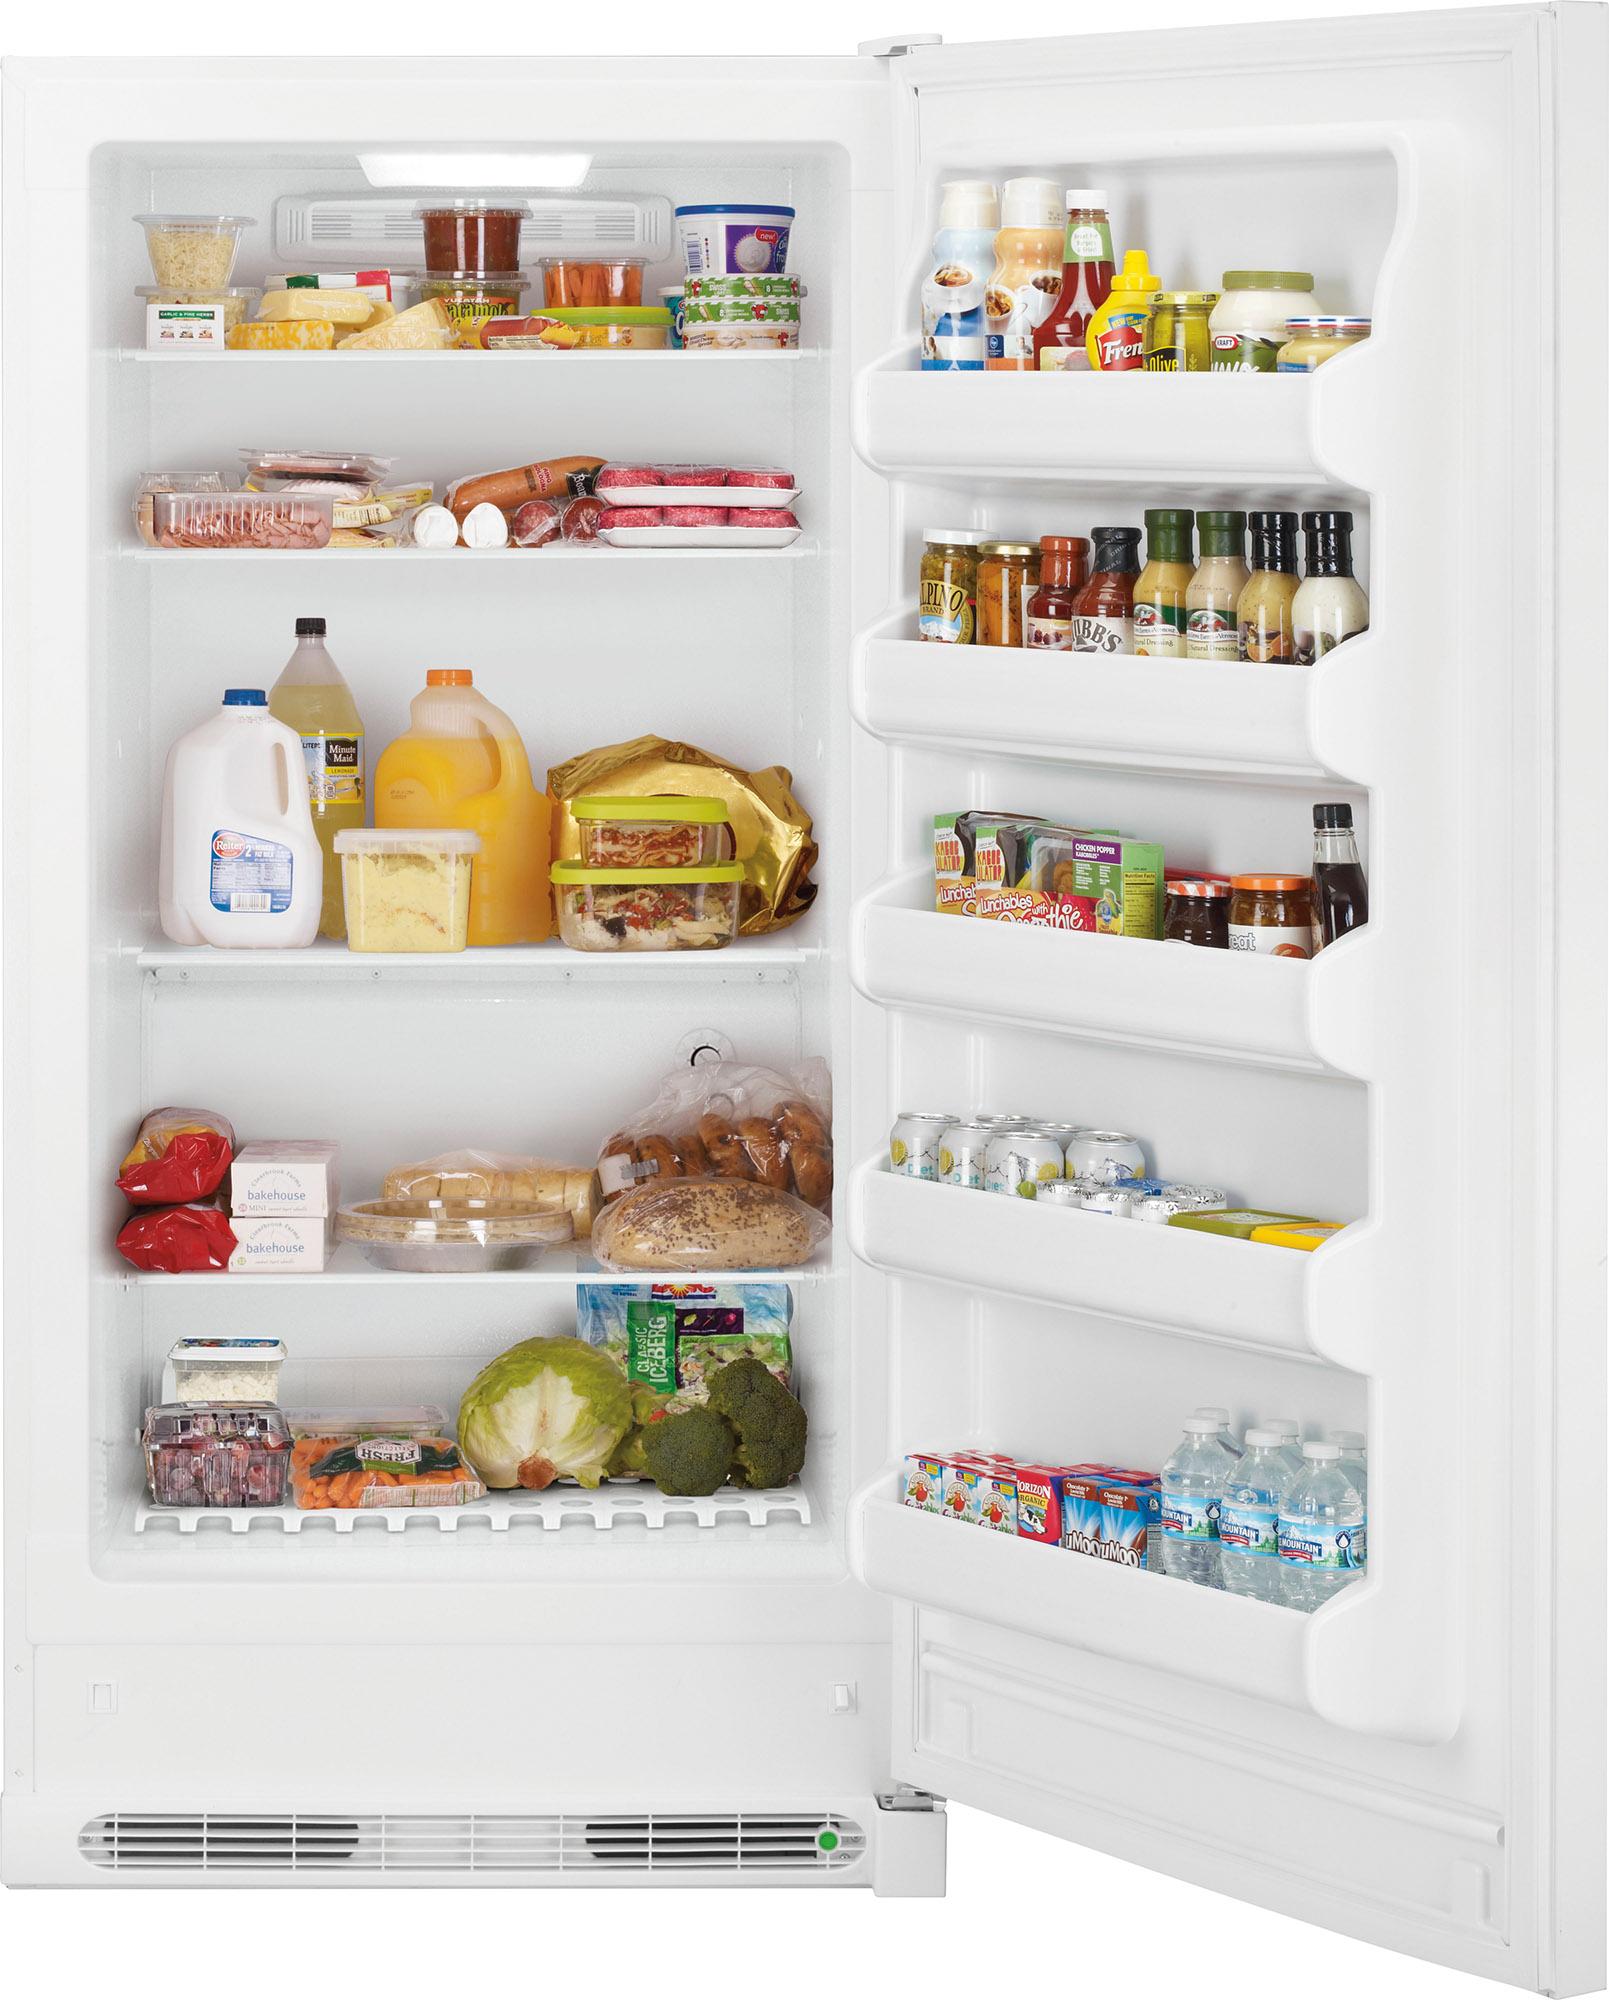 Kenmore 70722 16.7 cu. ft. Freezerless Refrigerator - White